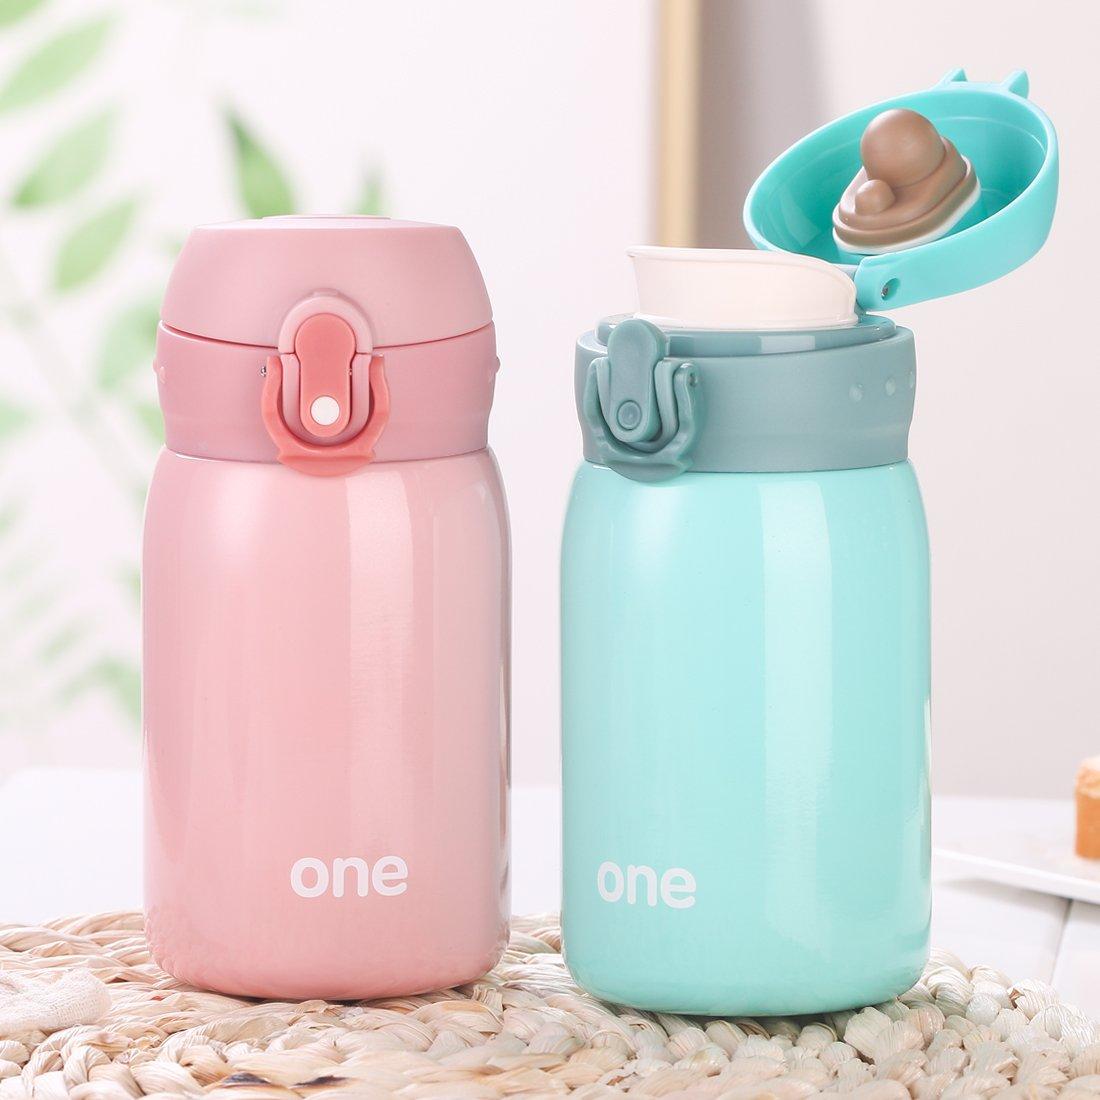 Kid&Girls 260ml/9oz Mini Insulated Water Bottle Drink Thermos Cute Stainless Steel Vacuum Flask,Leak-proof Travel Mug Coffee Tumbler (Green) by HOLD U FUN (Image #7)